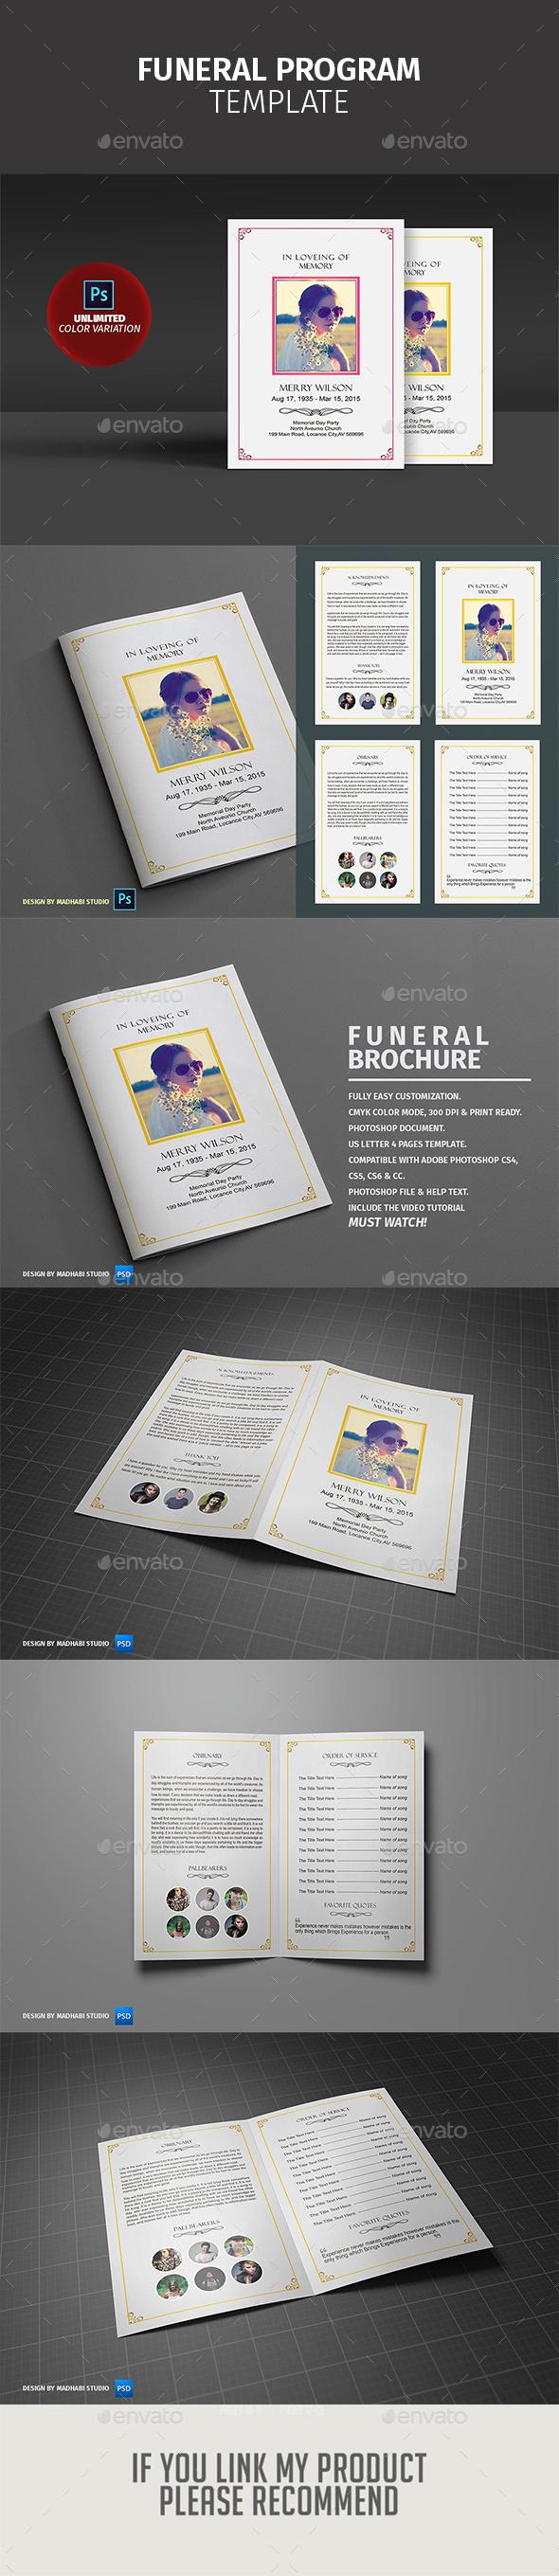 GraphicRiver Funeral Program Template V01 20979509